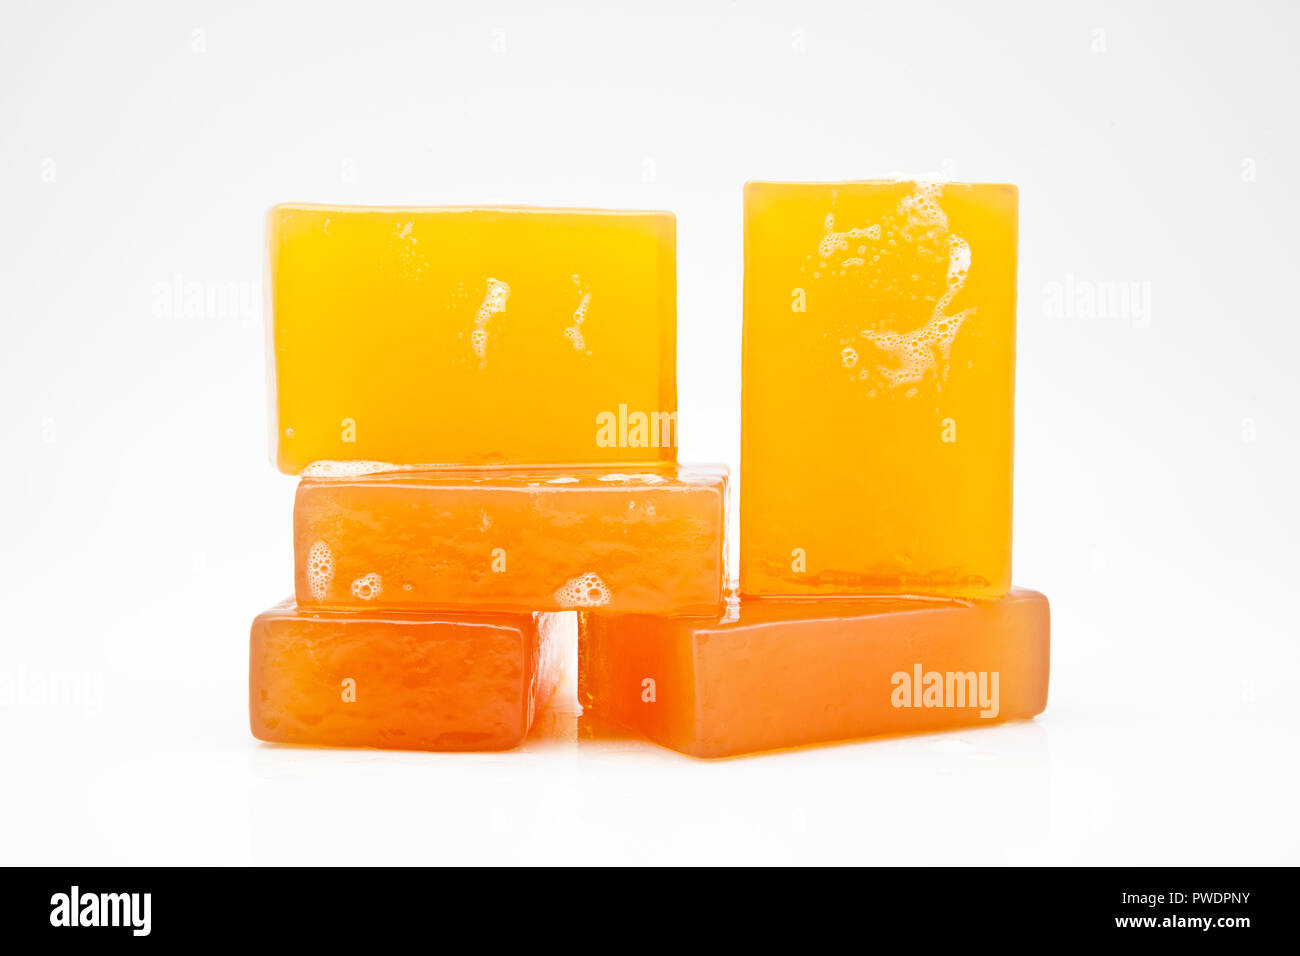 five bars of glycerin soap - Stock Image